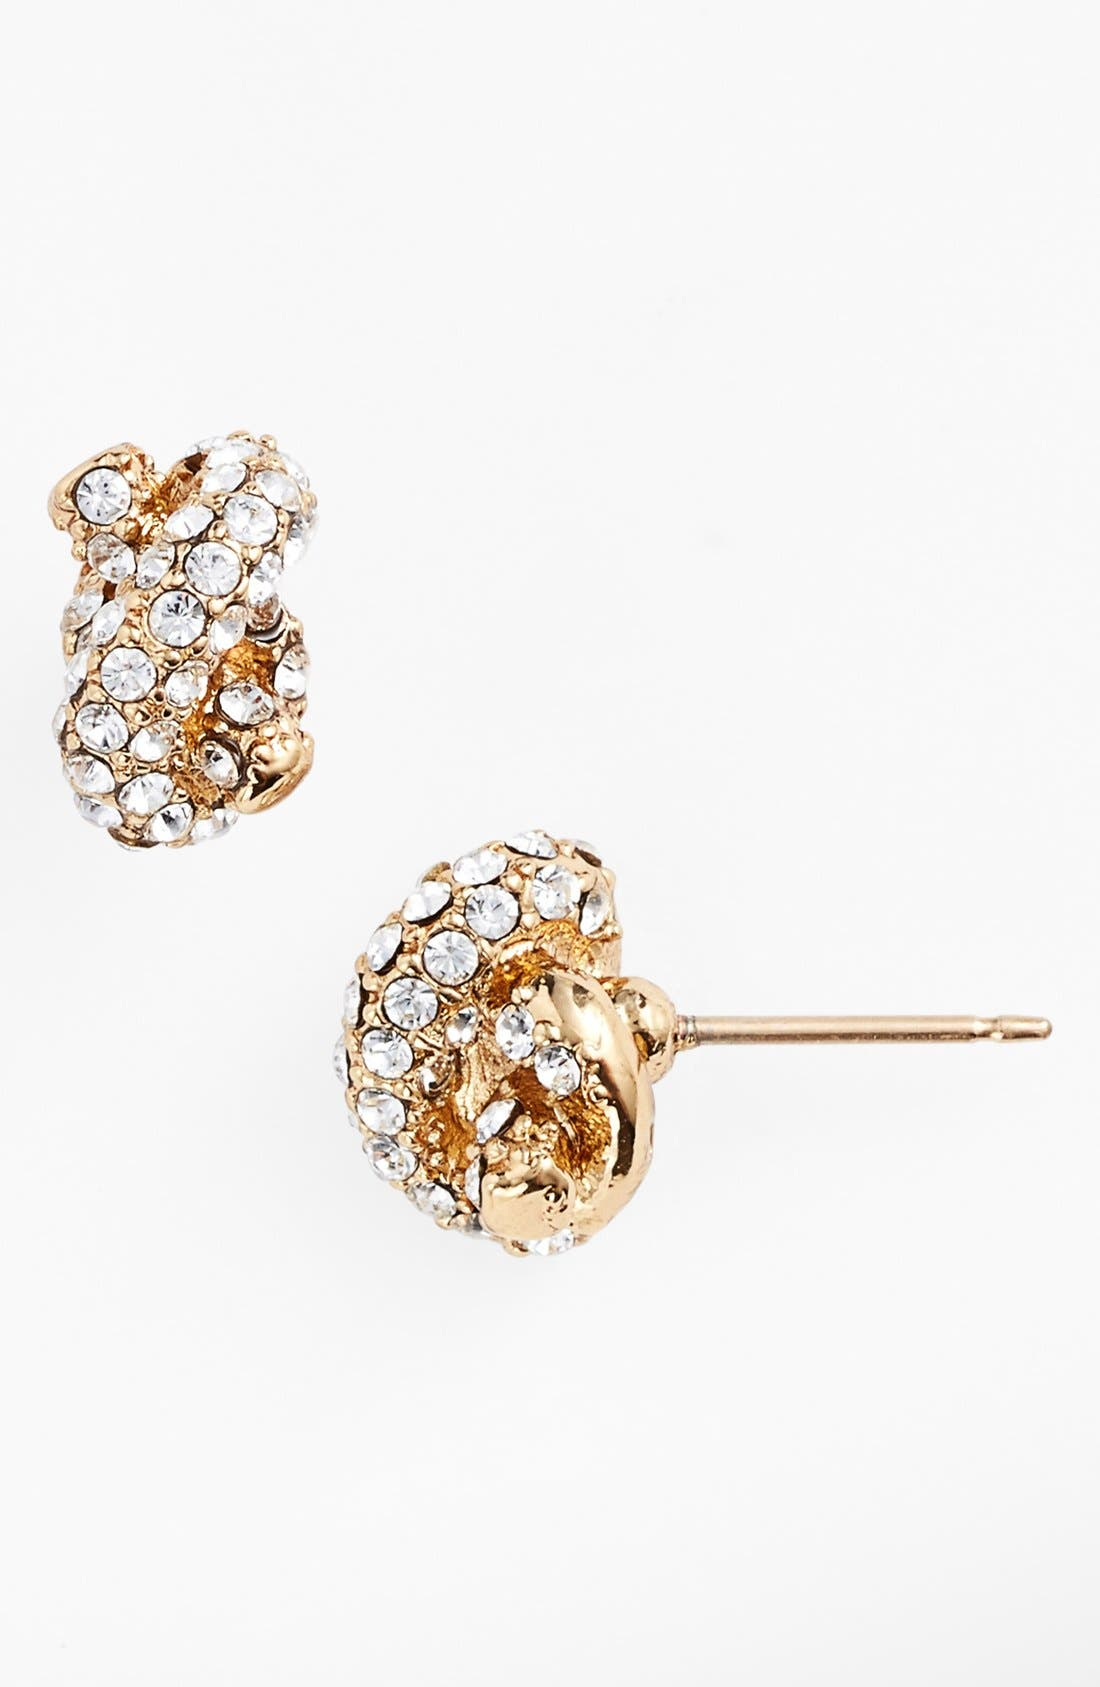 Main Image - kate spade new york 'sailors' knot' stud earrings